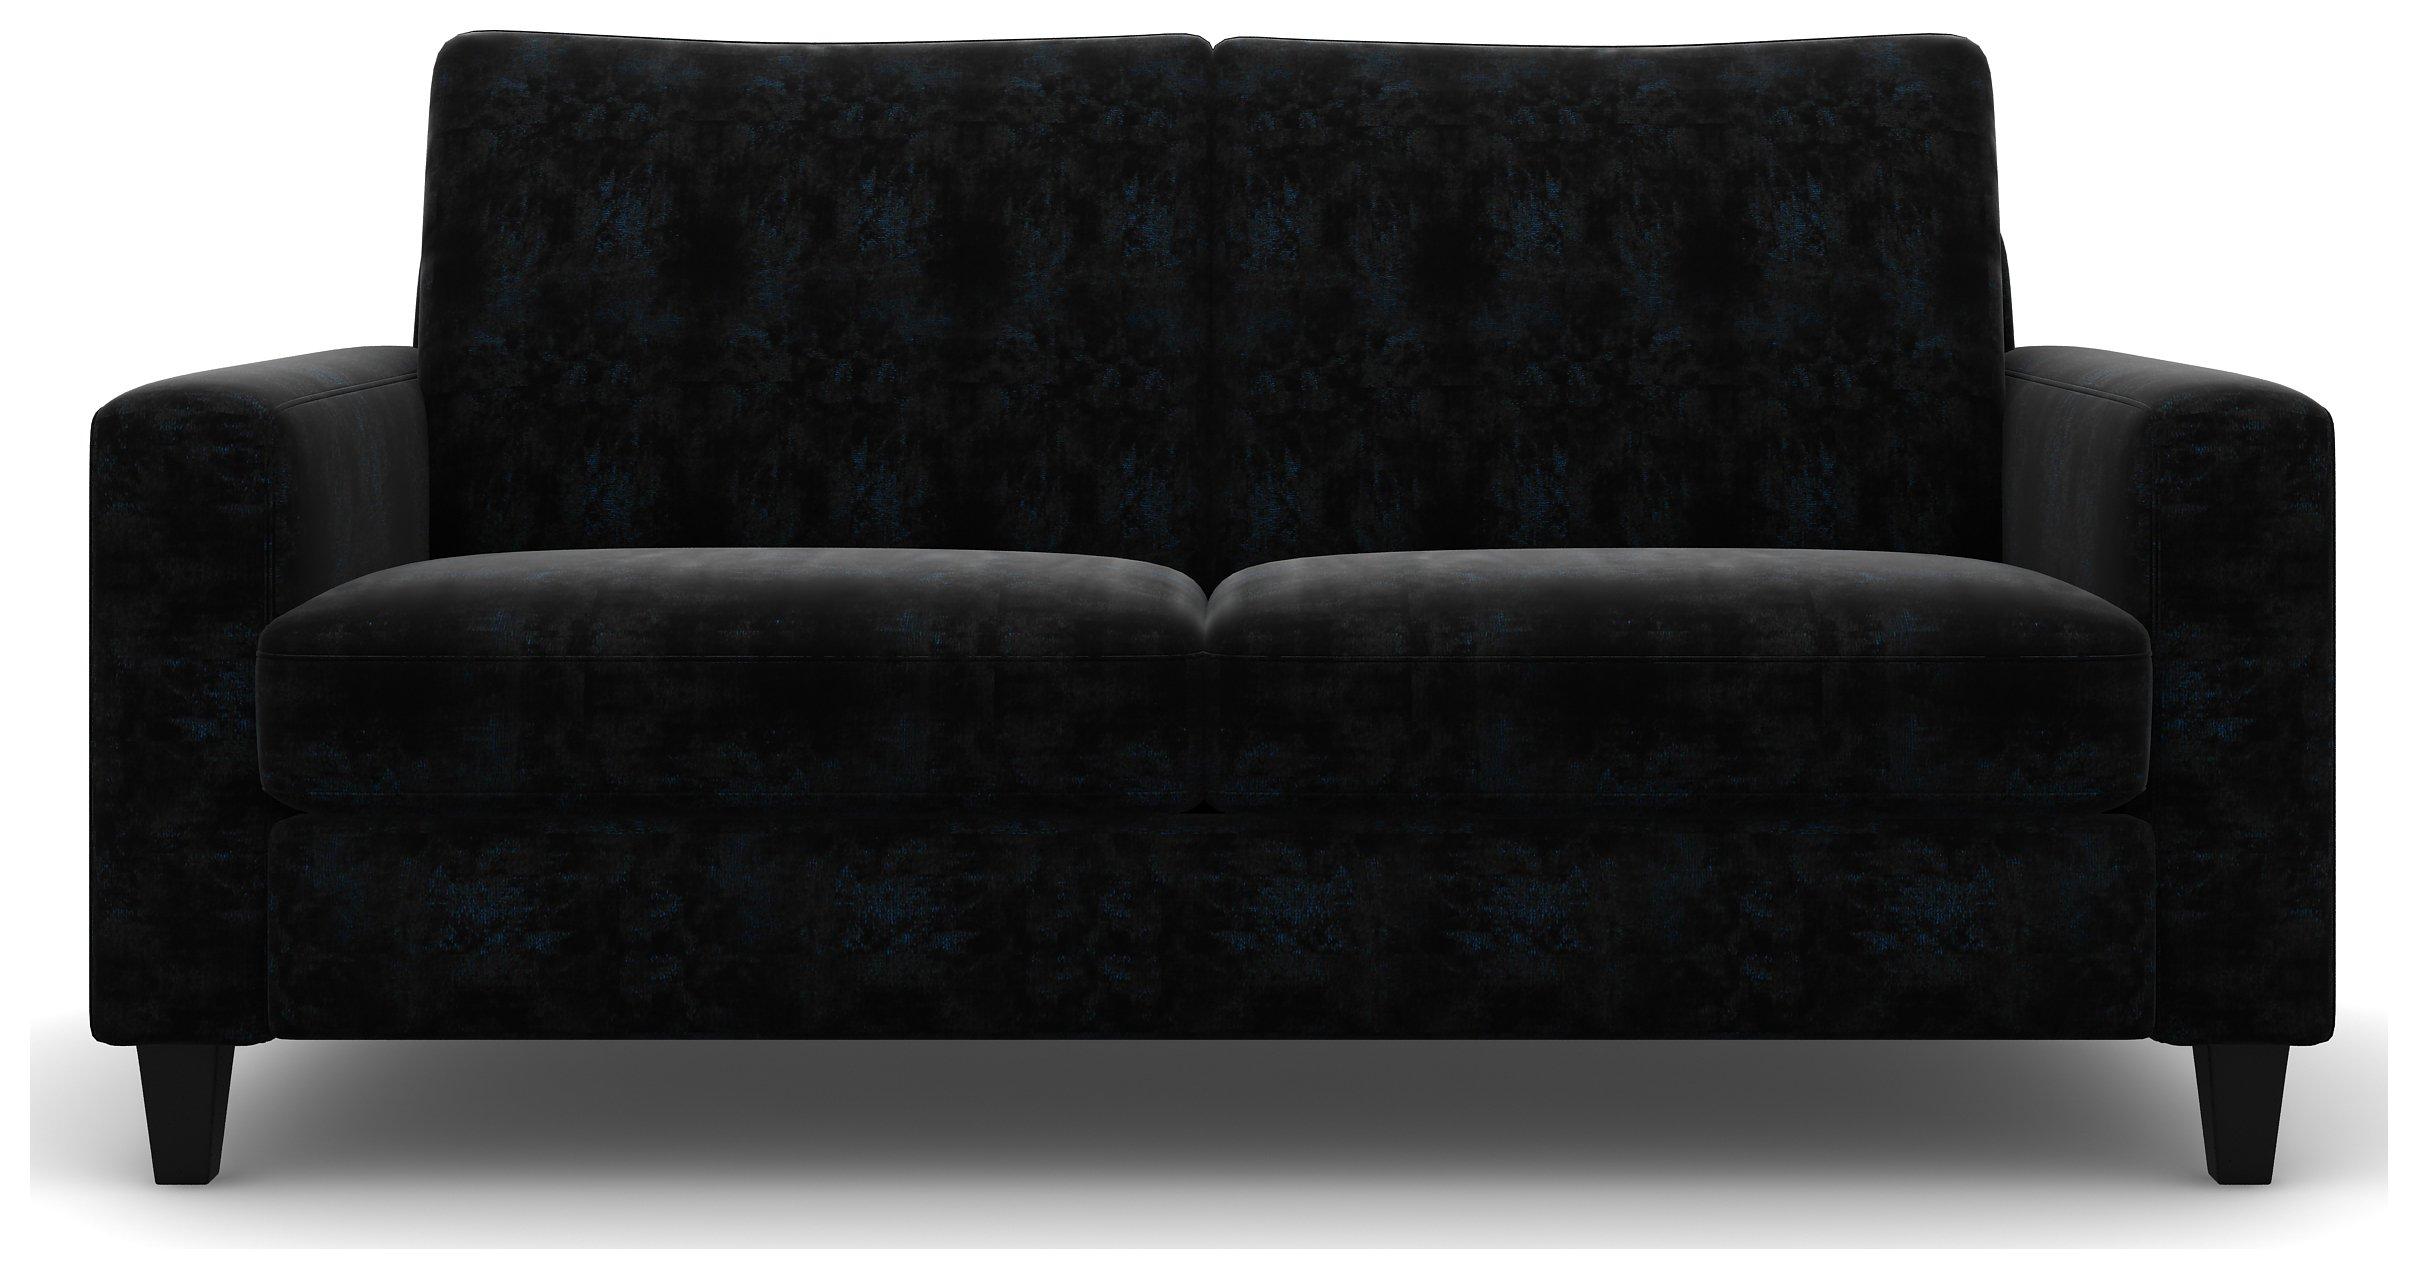 Heart of House Harrison 3 Seat Shimmer Fabric Sofa - Black.